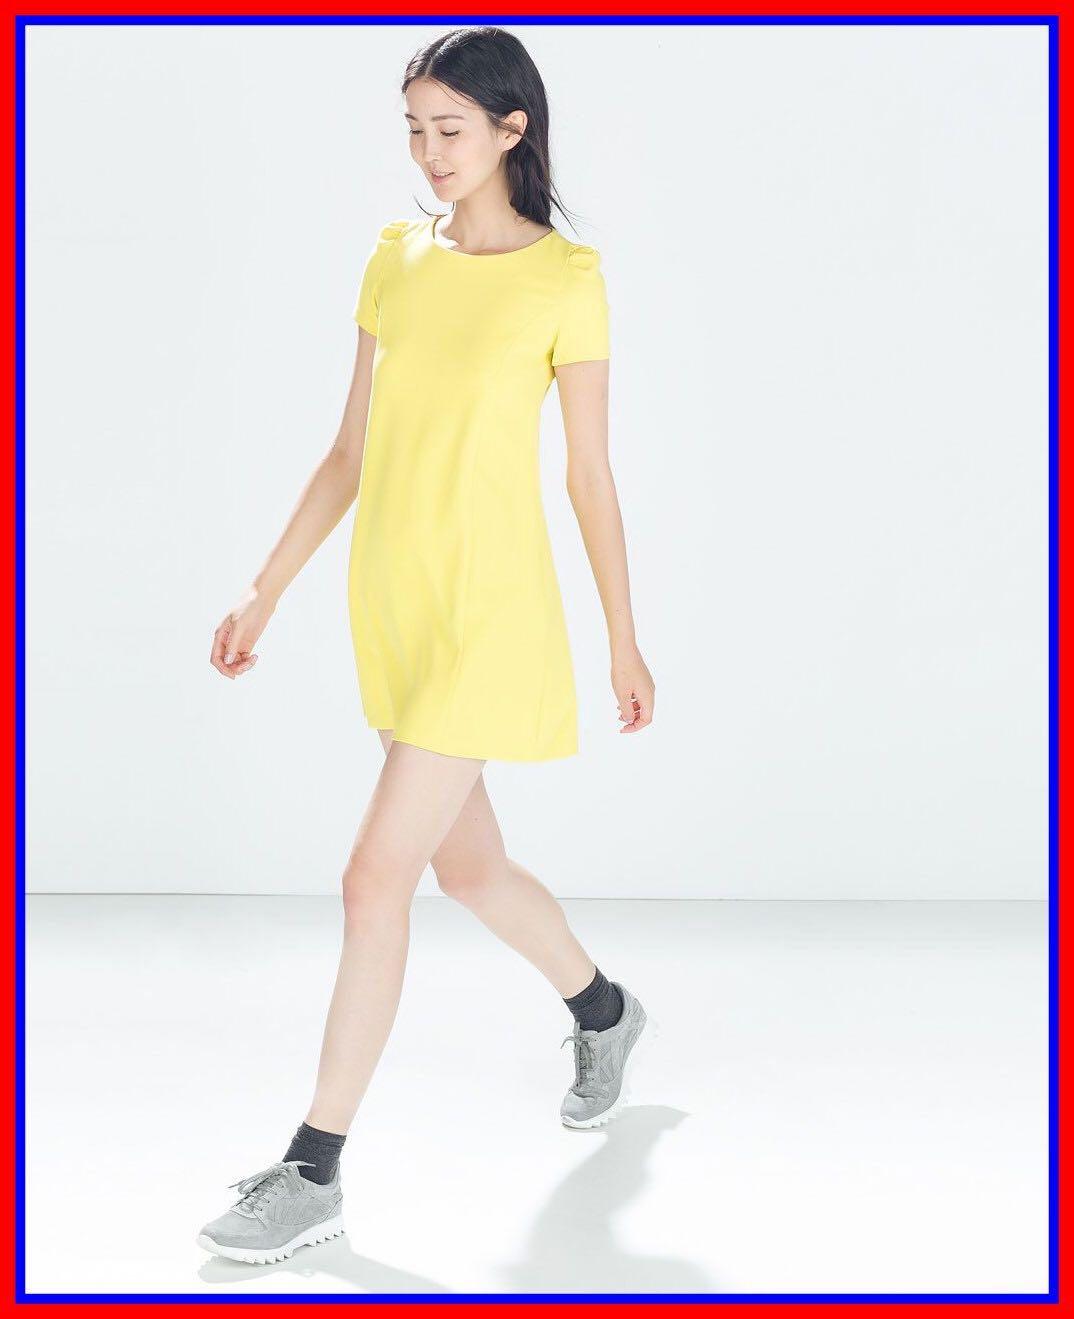 fbb7704a Zara yellow short sleeved dress, Women's Fashion, Clothes, Dresses ...